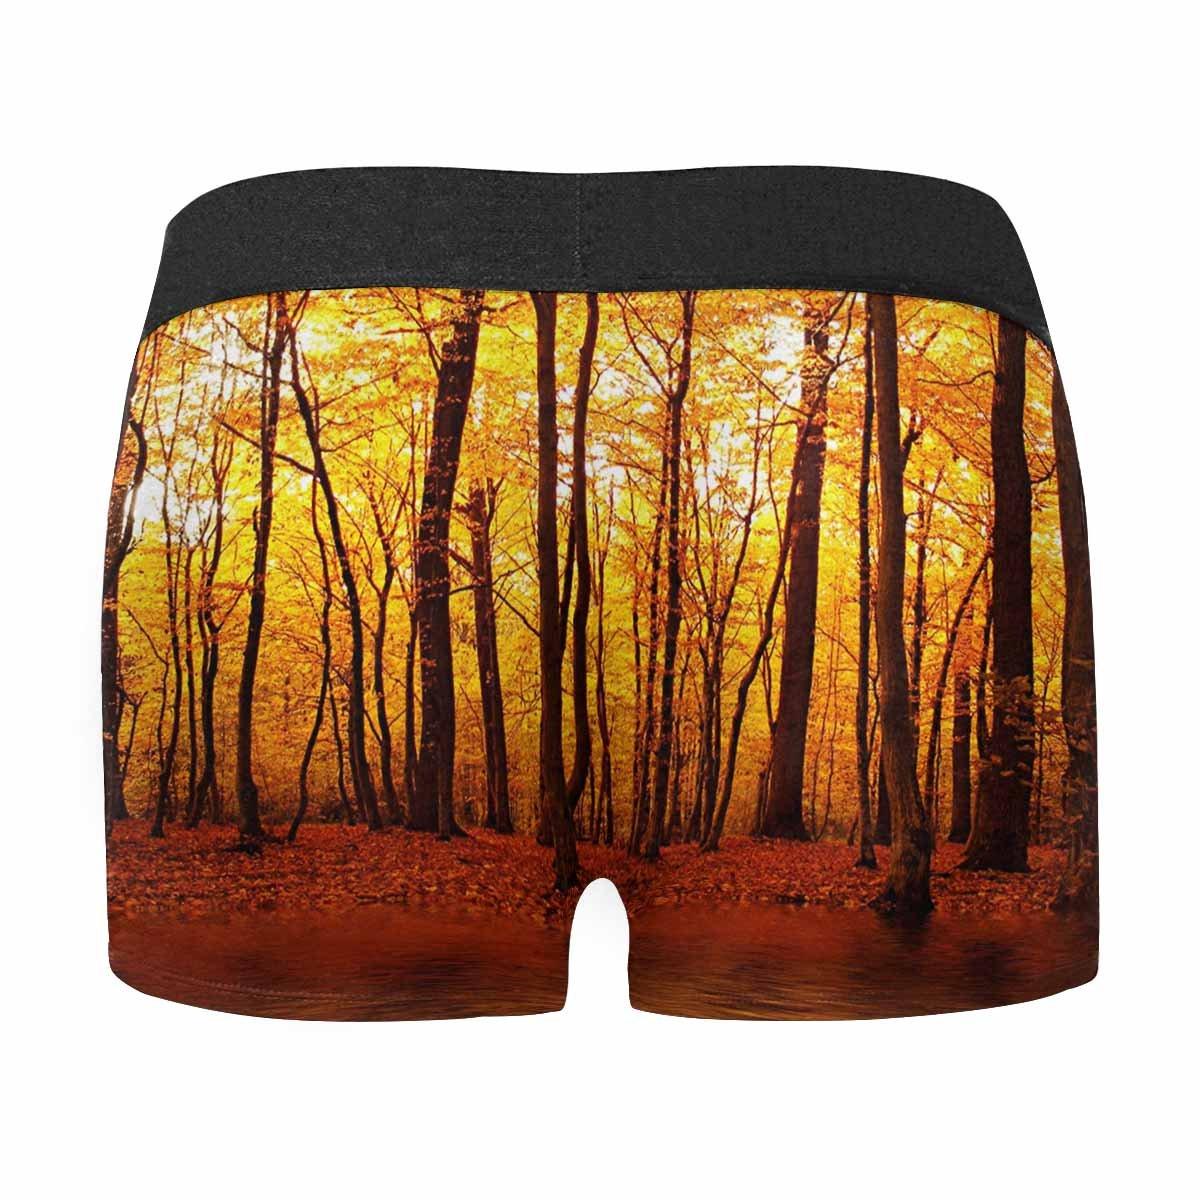 XS-3XL INTERESTPRINT Boxer Briefs Mens Underwear Lake in Autumn Forest Beautiful Nature